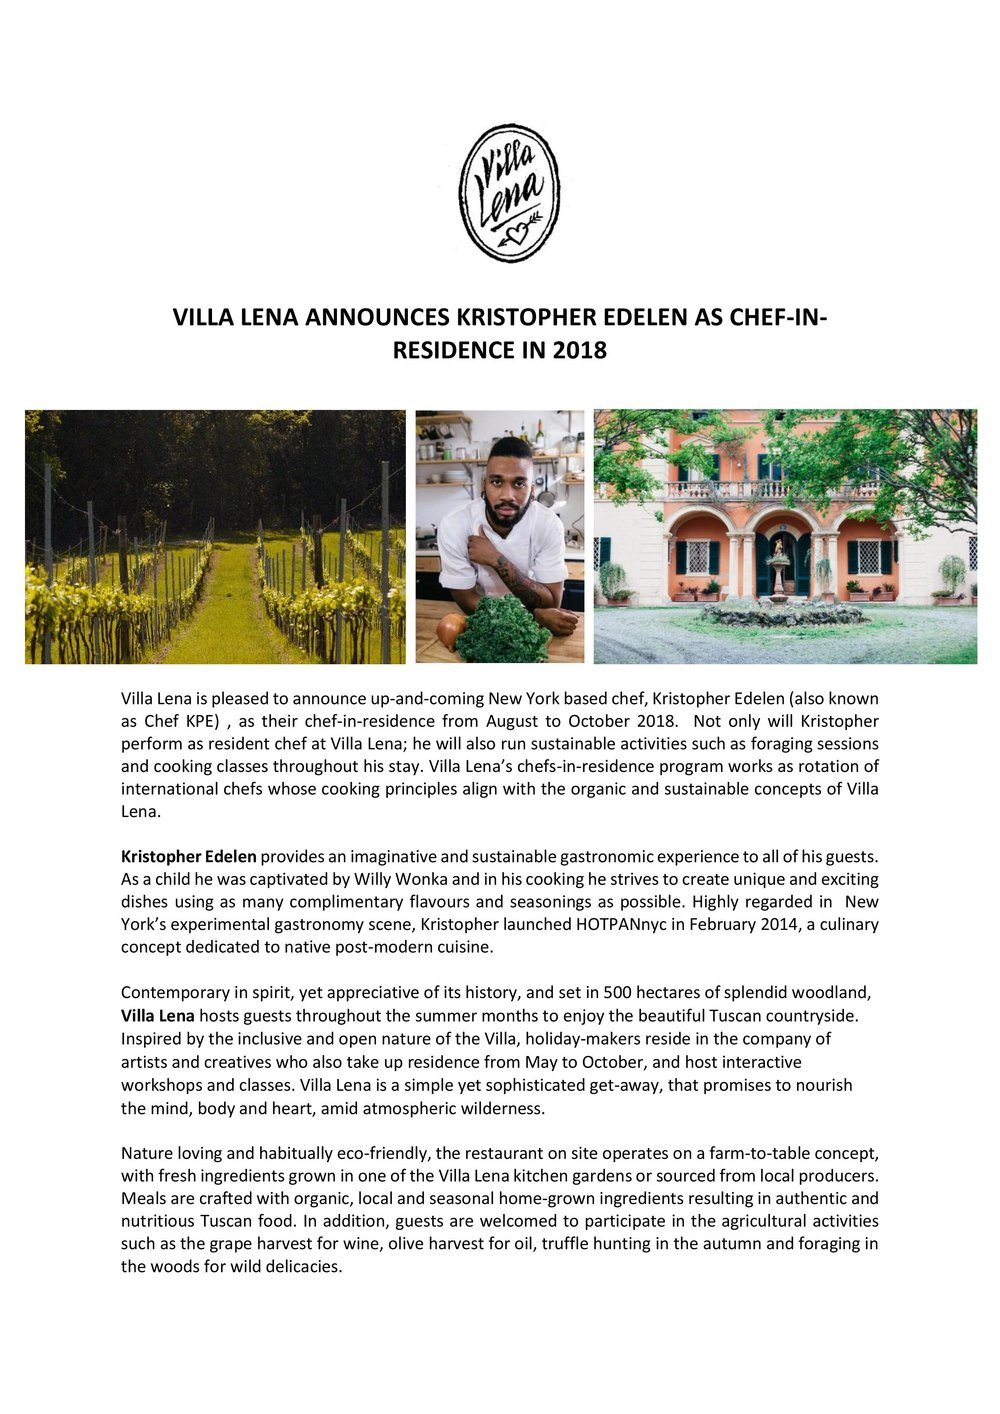 VILLA LENA 2018 CHEFS RESIDENCY-page-001.jpg